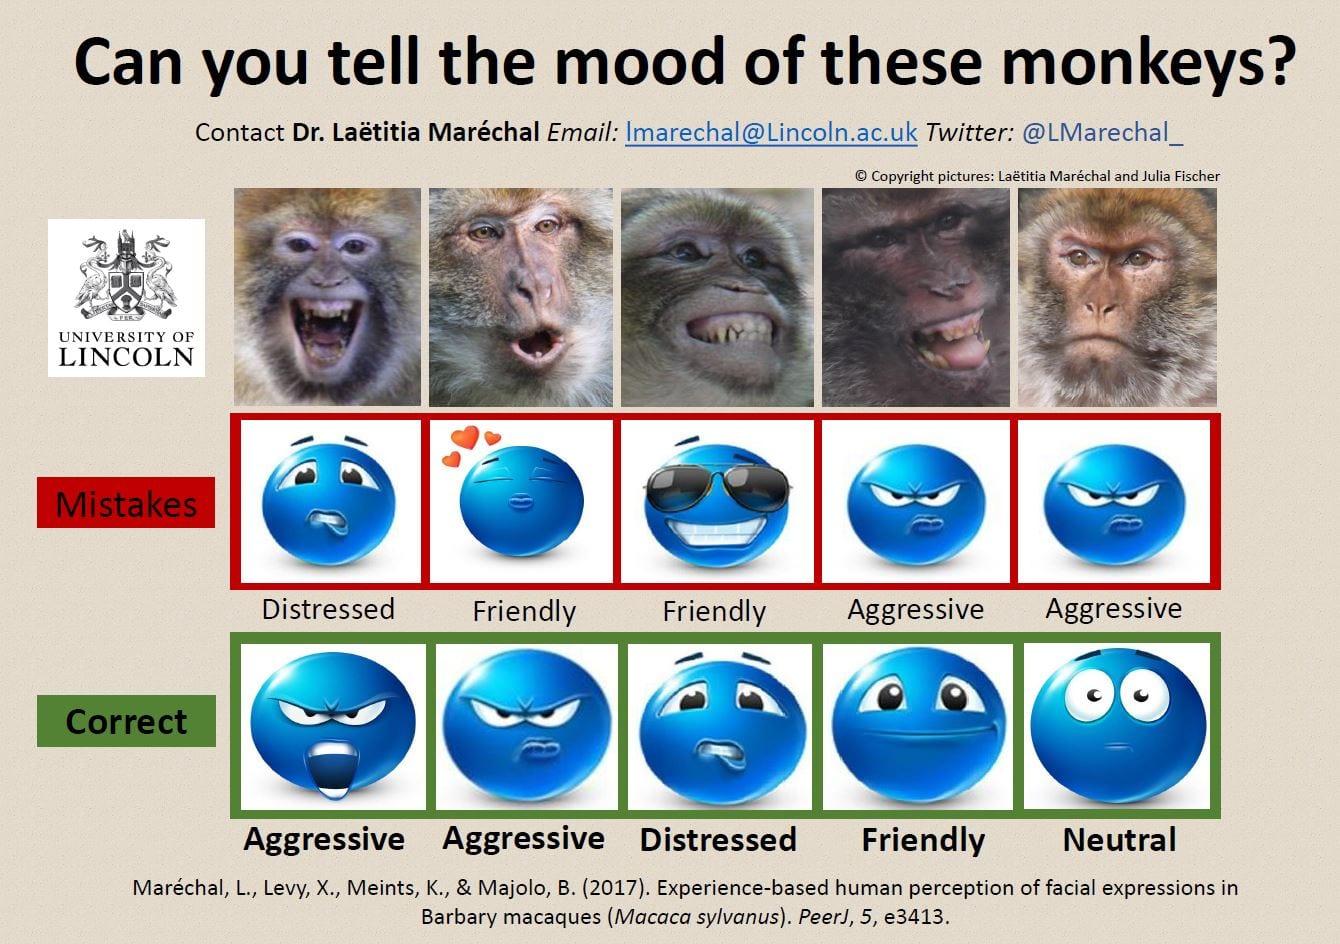 Monkey Moods